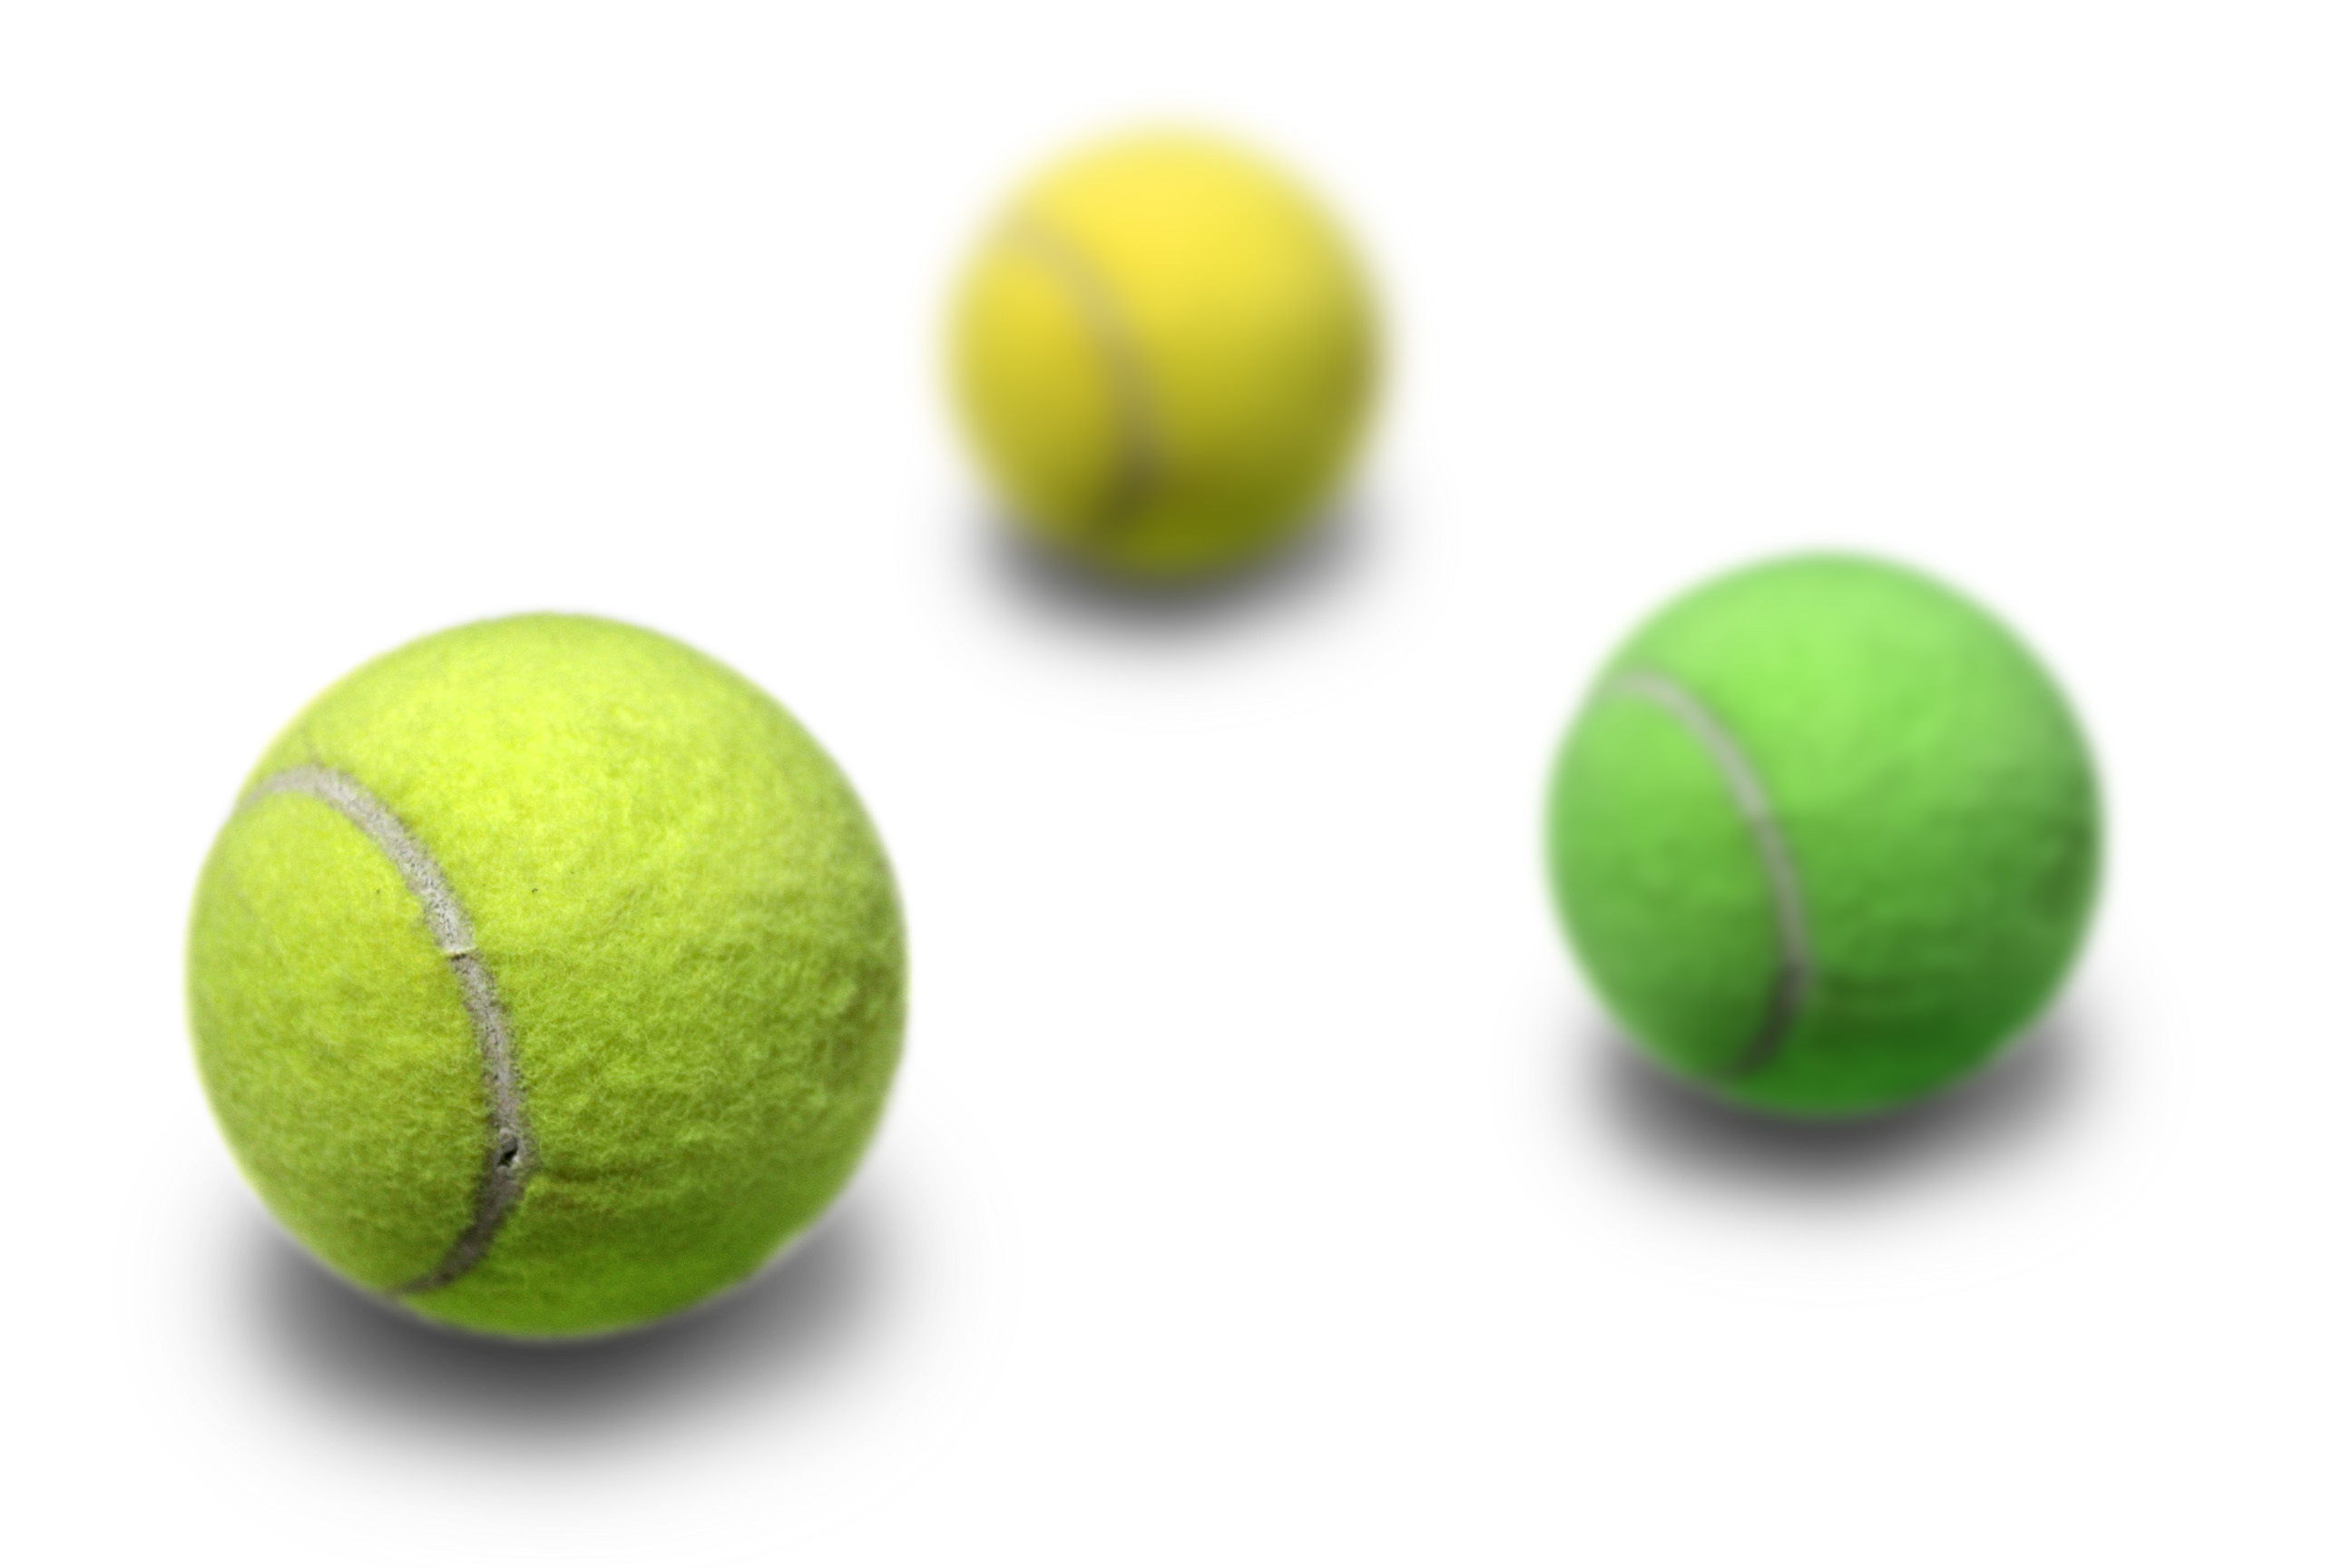 balls bouncing